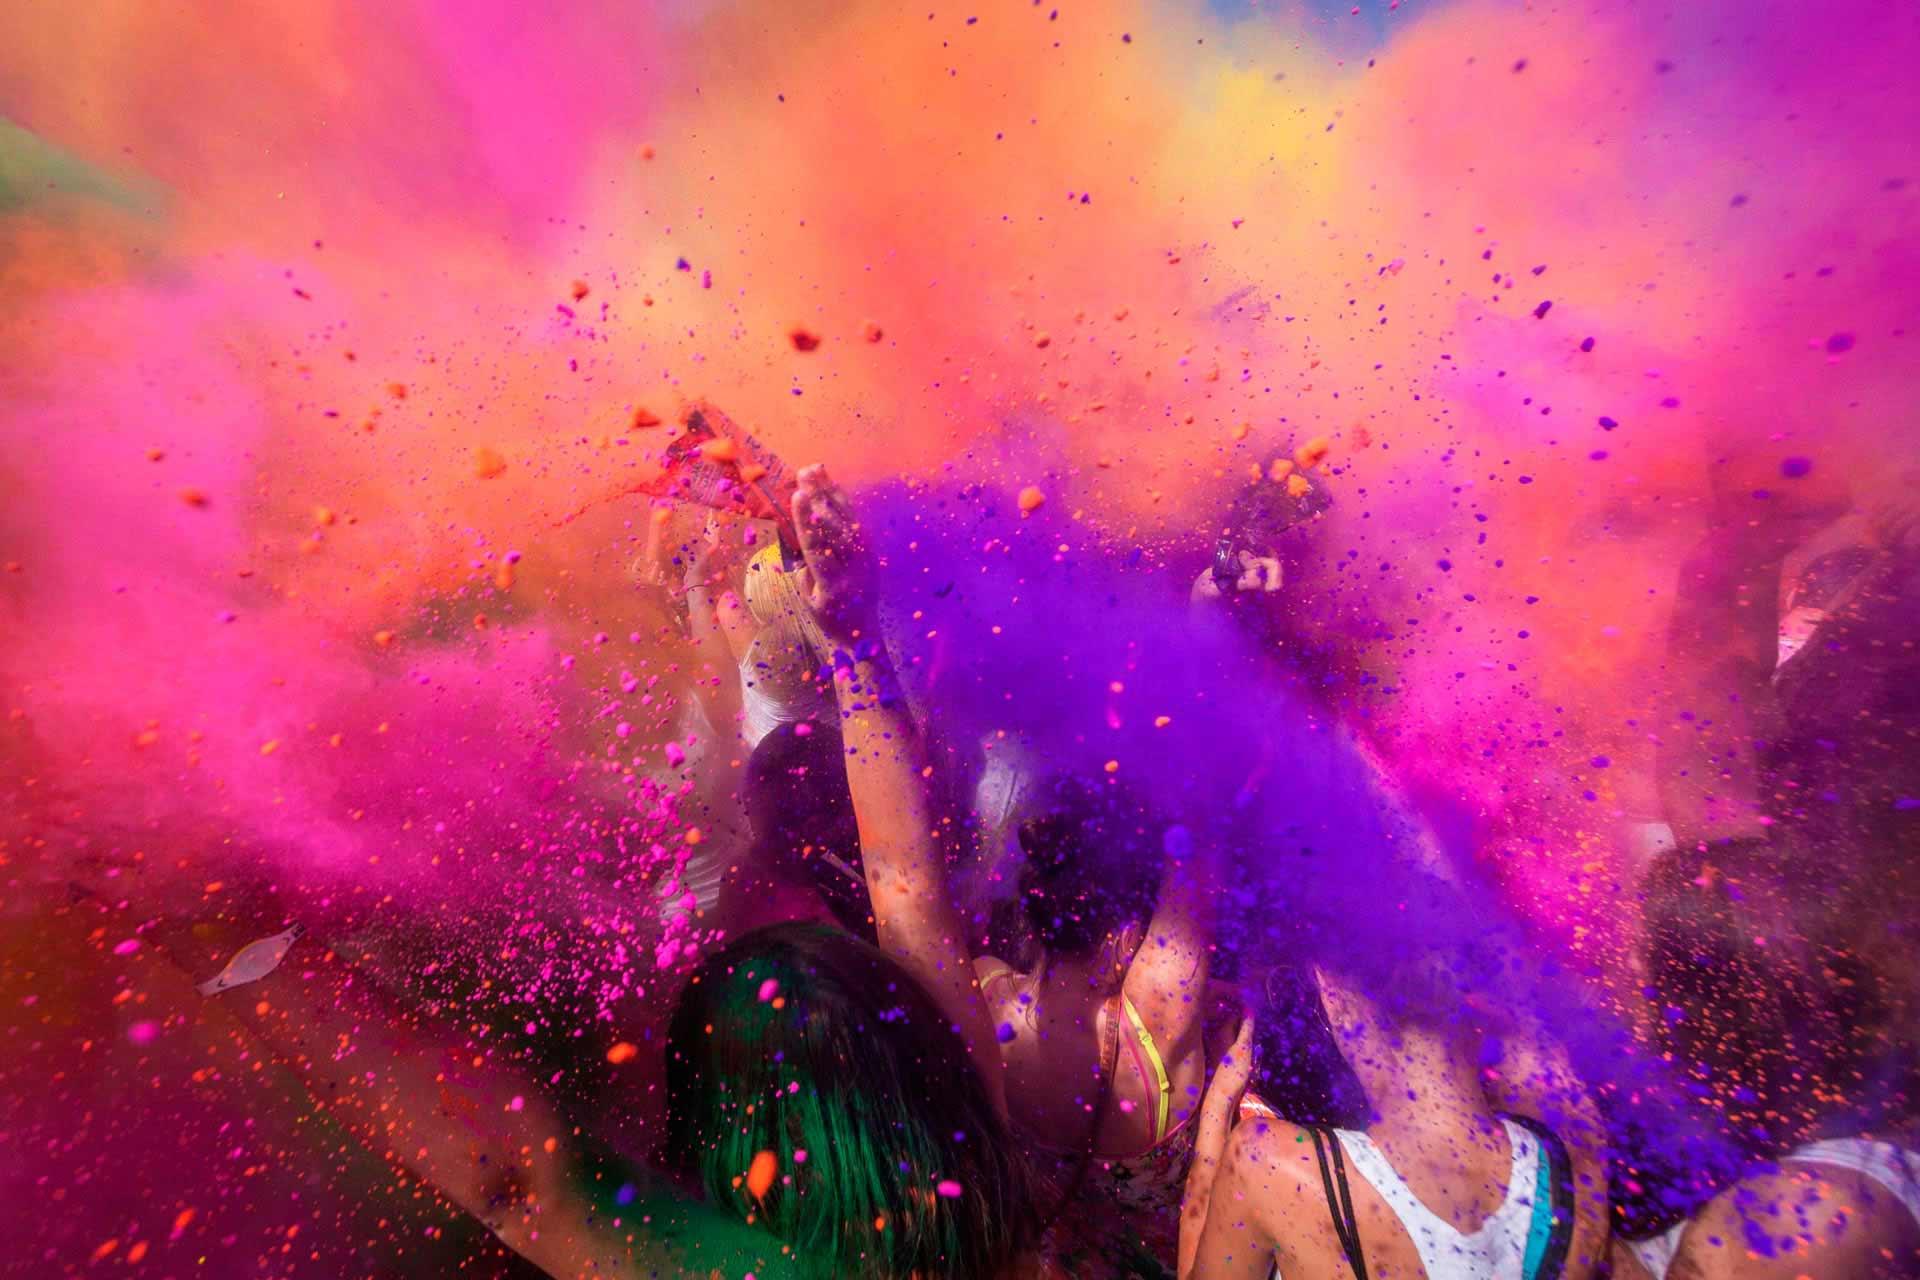 Dale color a tu empresa